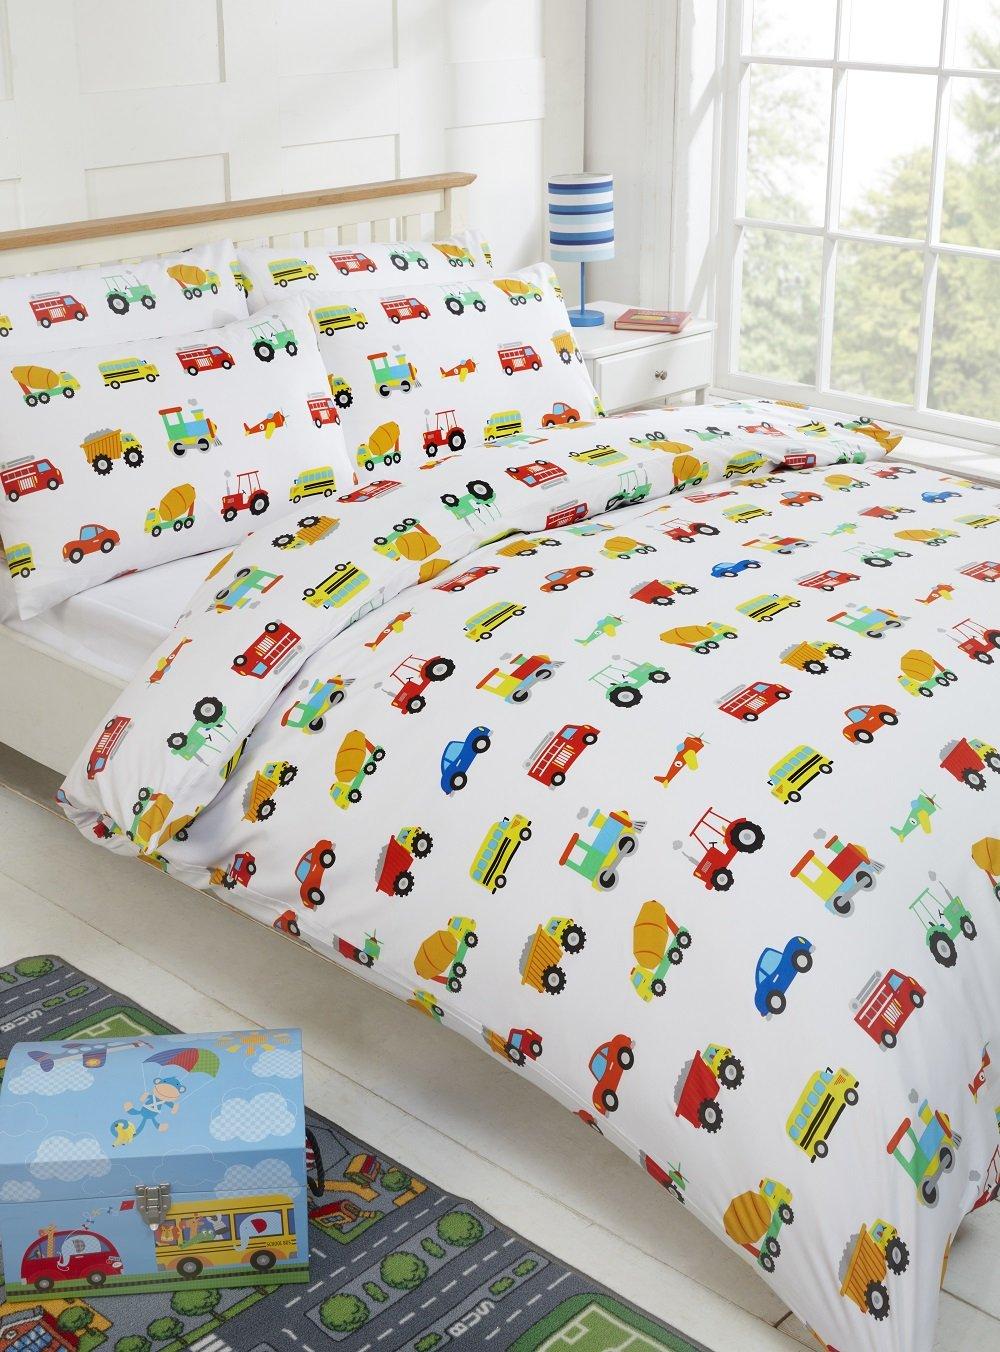 100% Cotton Kids Duvet Cover Set 200 Thread Count Cars Traffic Planes Trucks Trains (Single Duvet Cover & 1 Pillowcase) Novelux